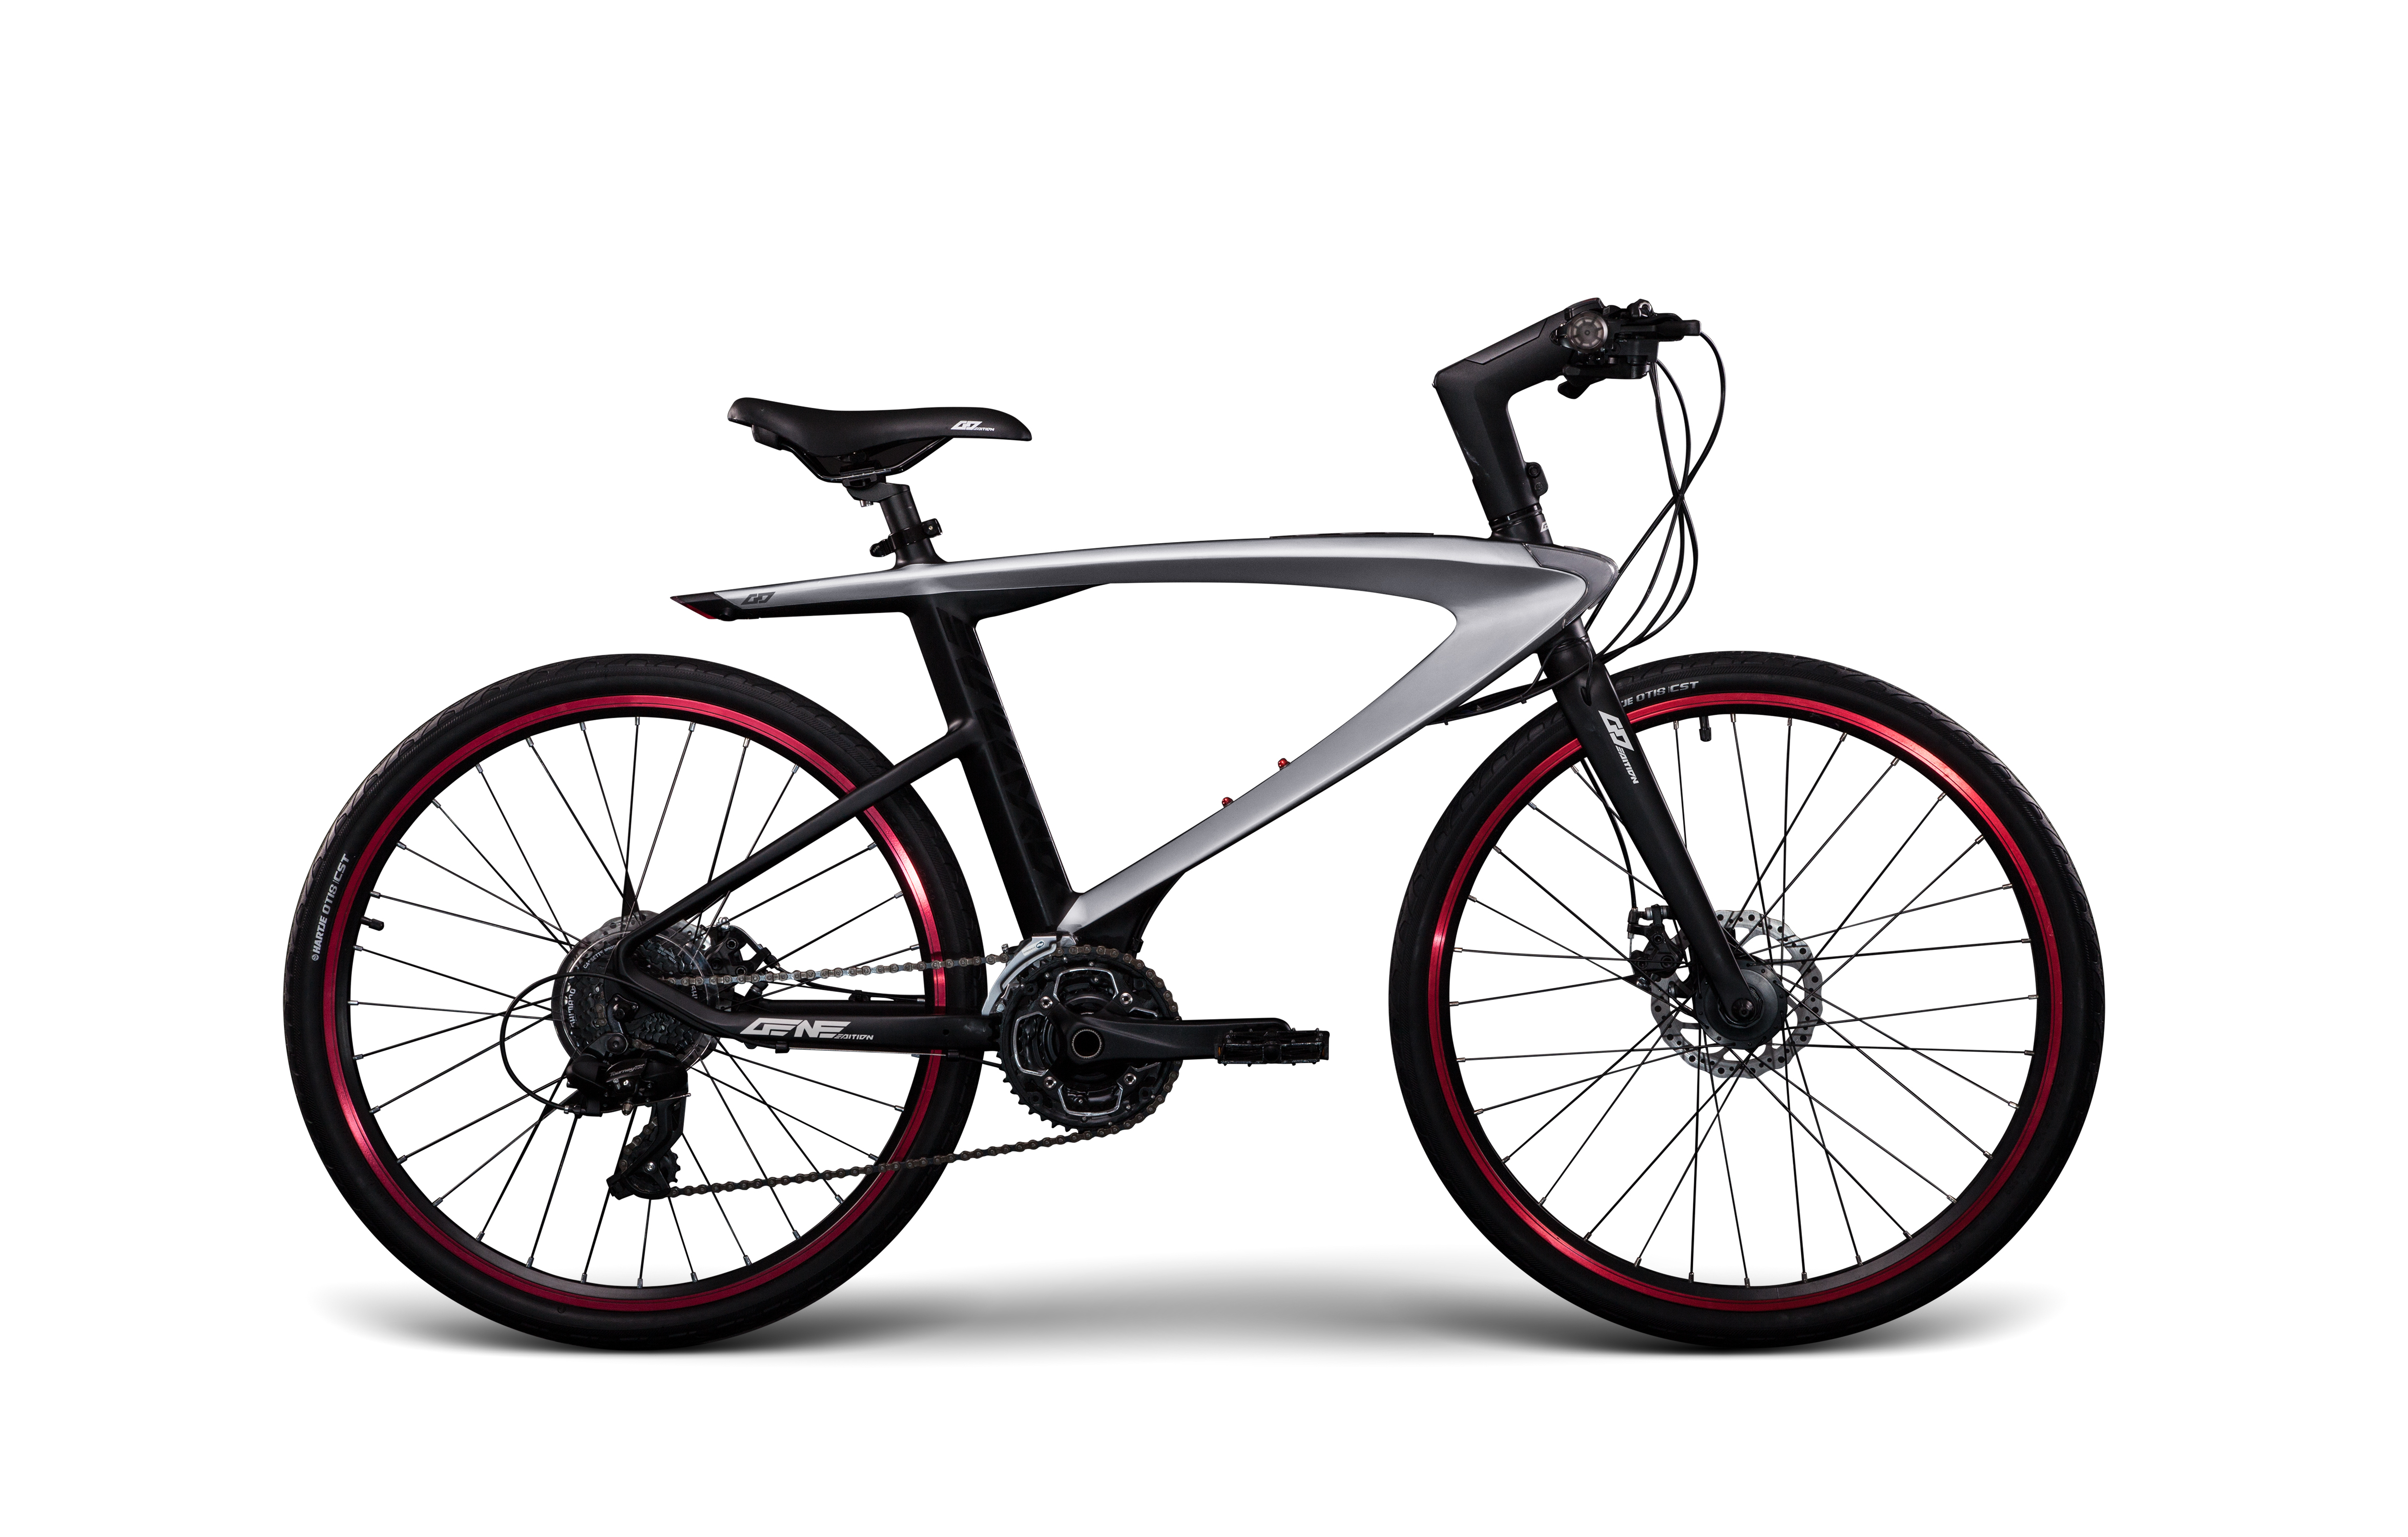 Super Bike a Ce fac producatorii de smartphone-uri cand nu fabrica telefoane? Fabrica biciclete!